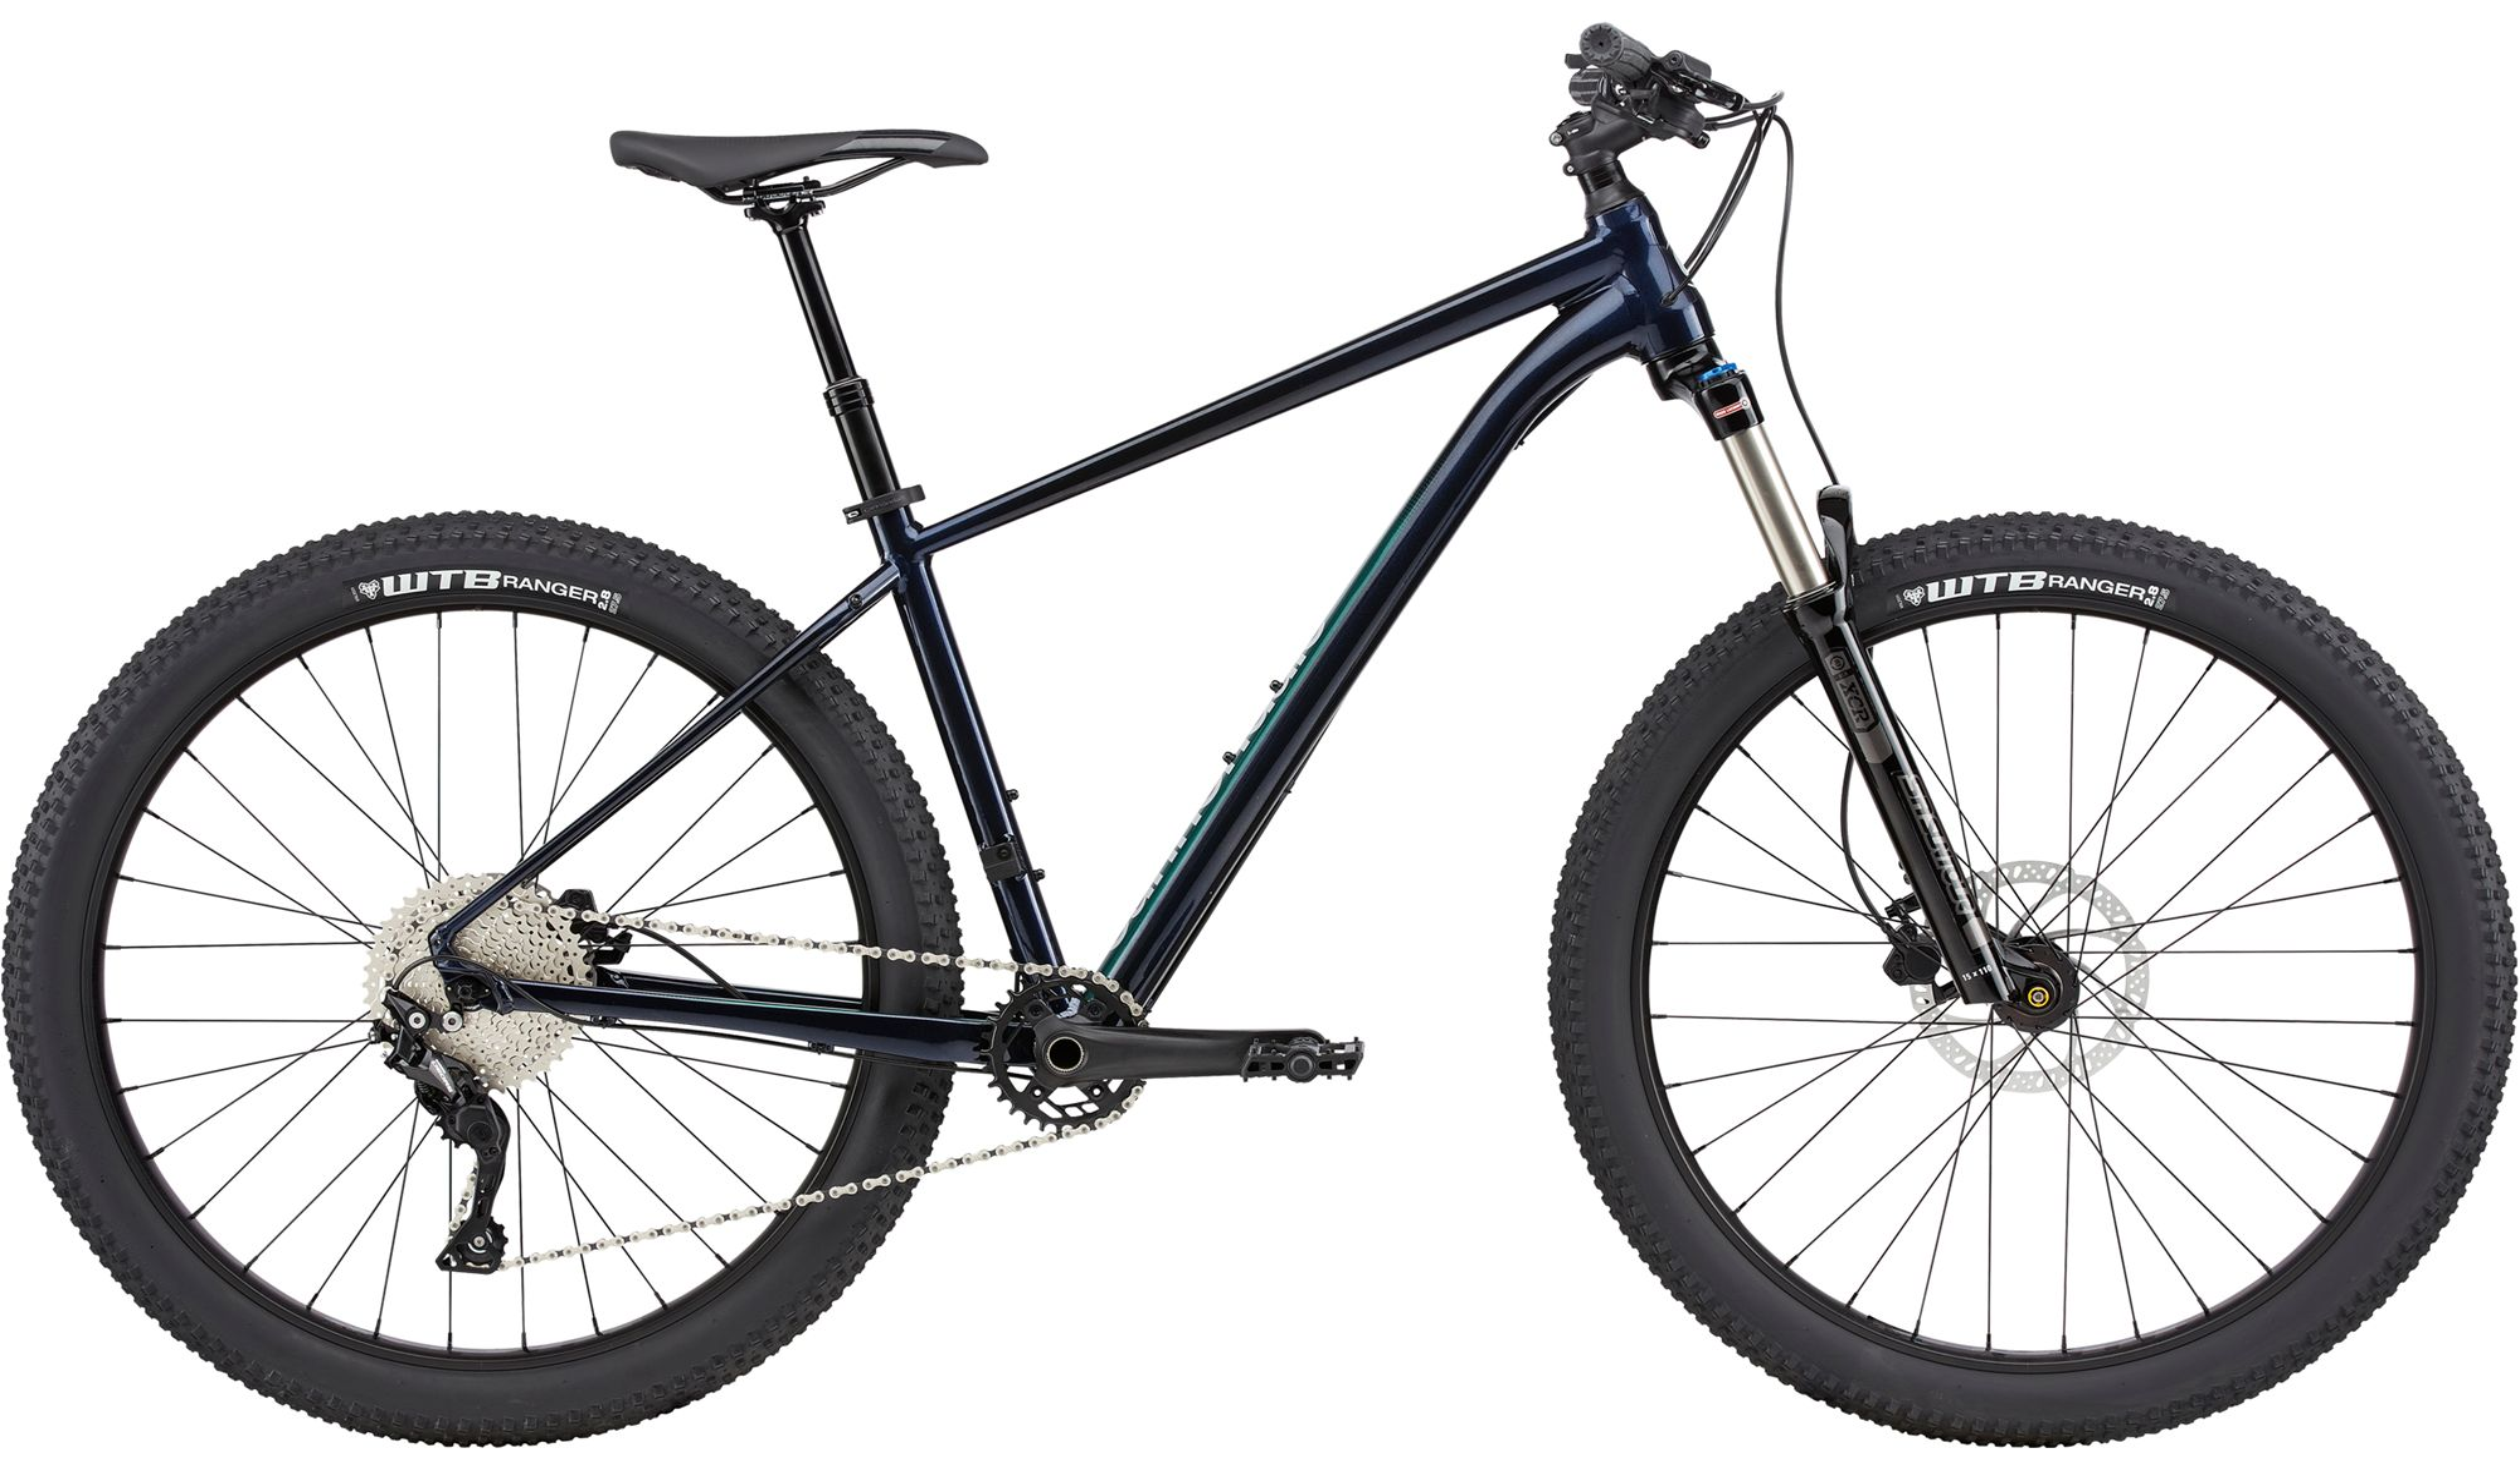 Cannondale Cujo 3 650b Mountain Bike 2020 | Mountainbikes